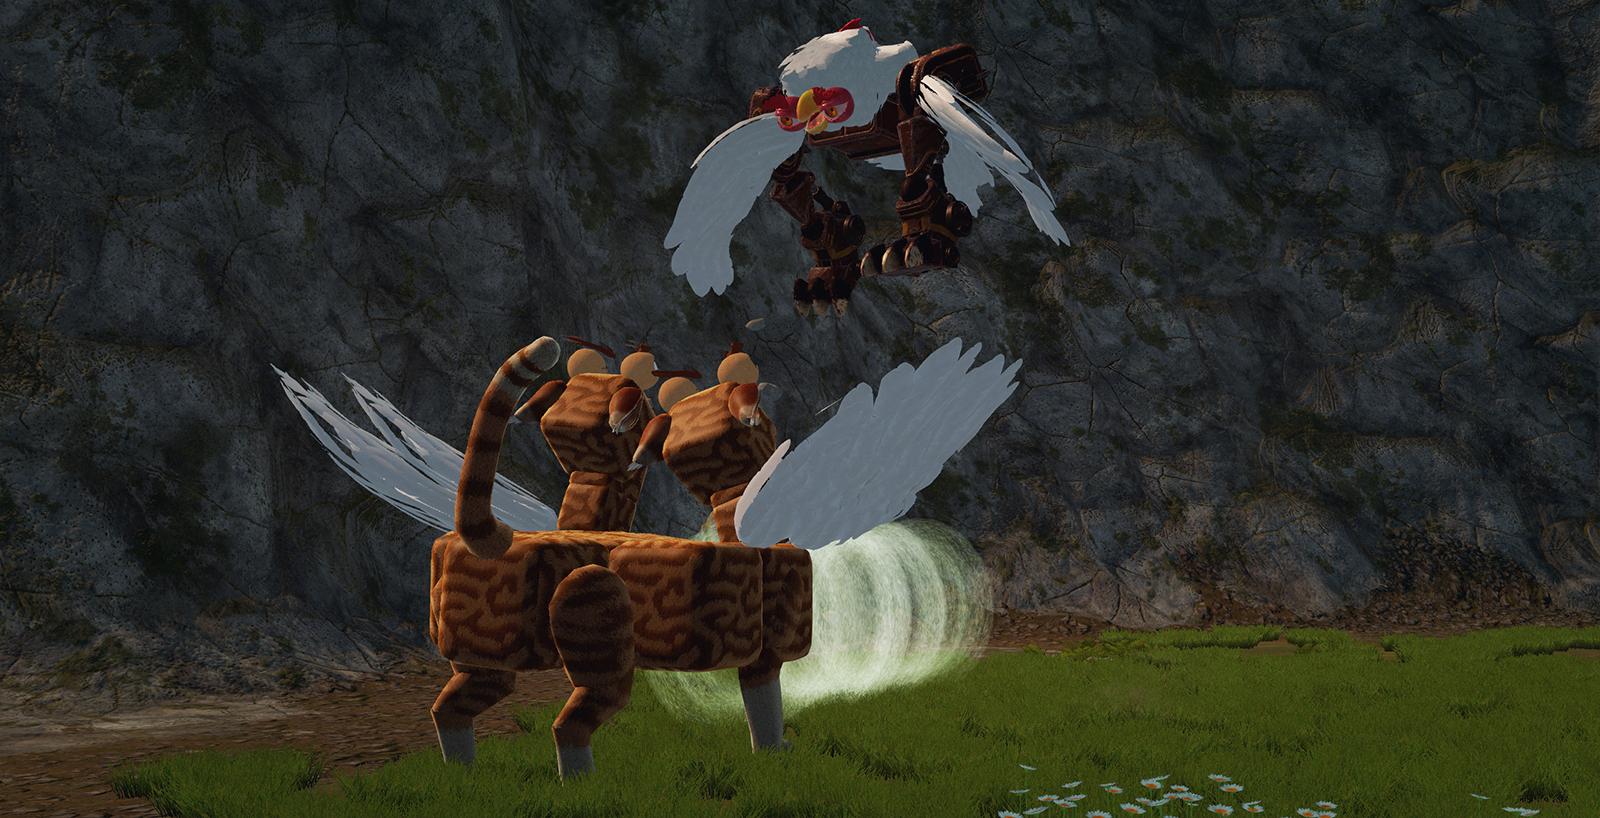 Wings are pretty darn useful.